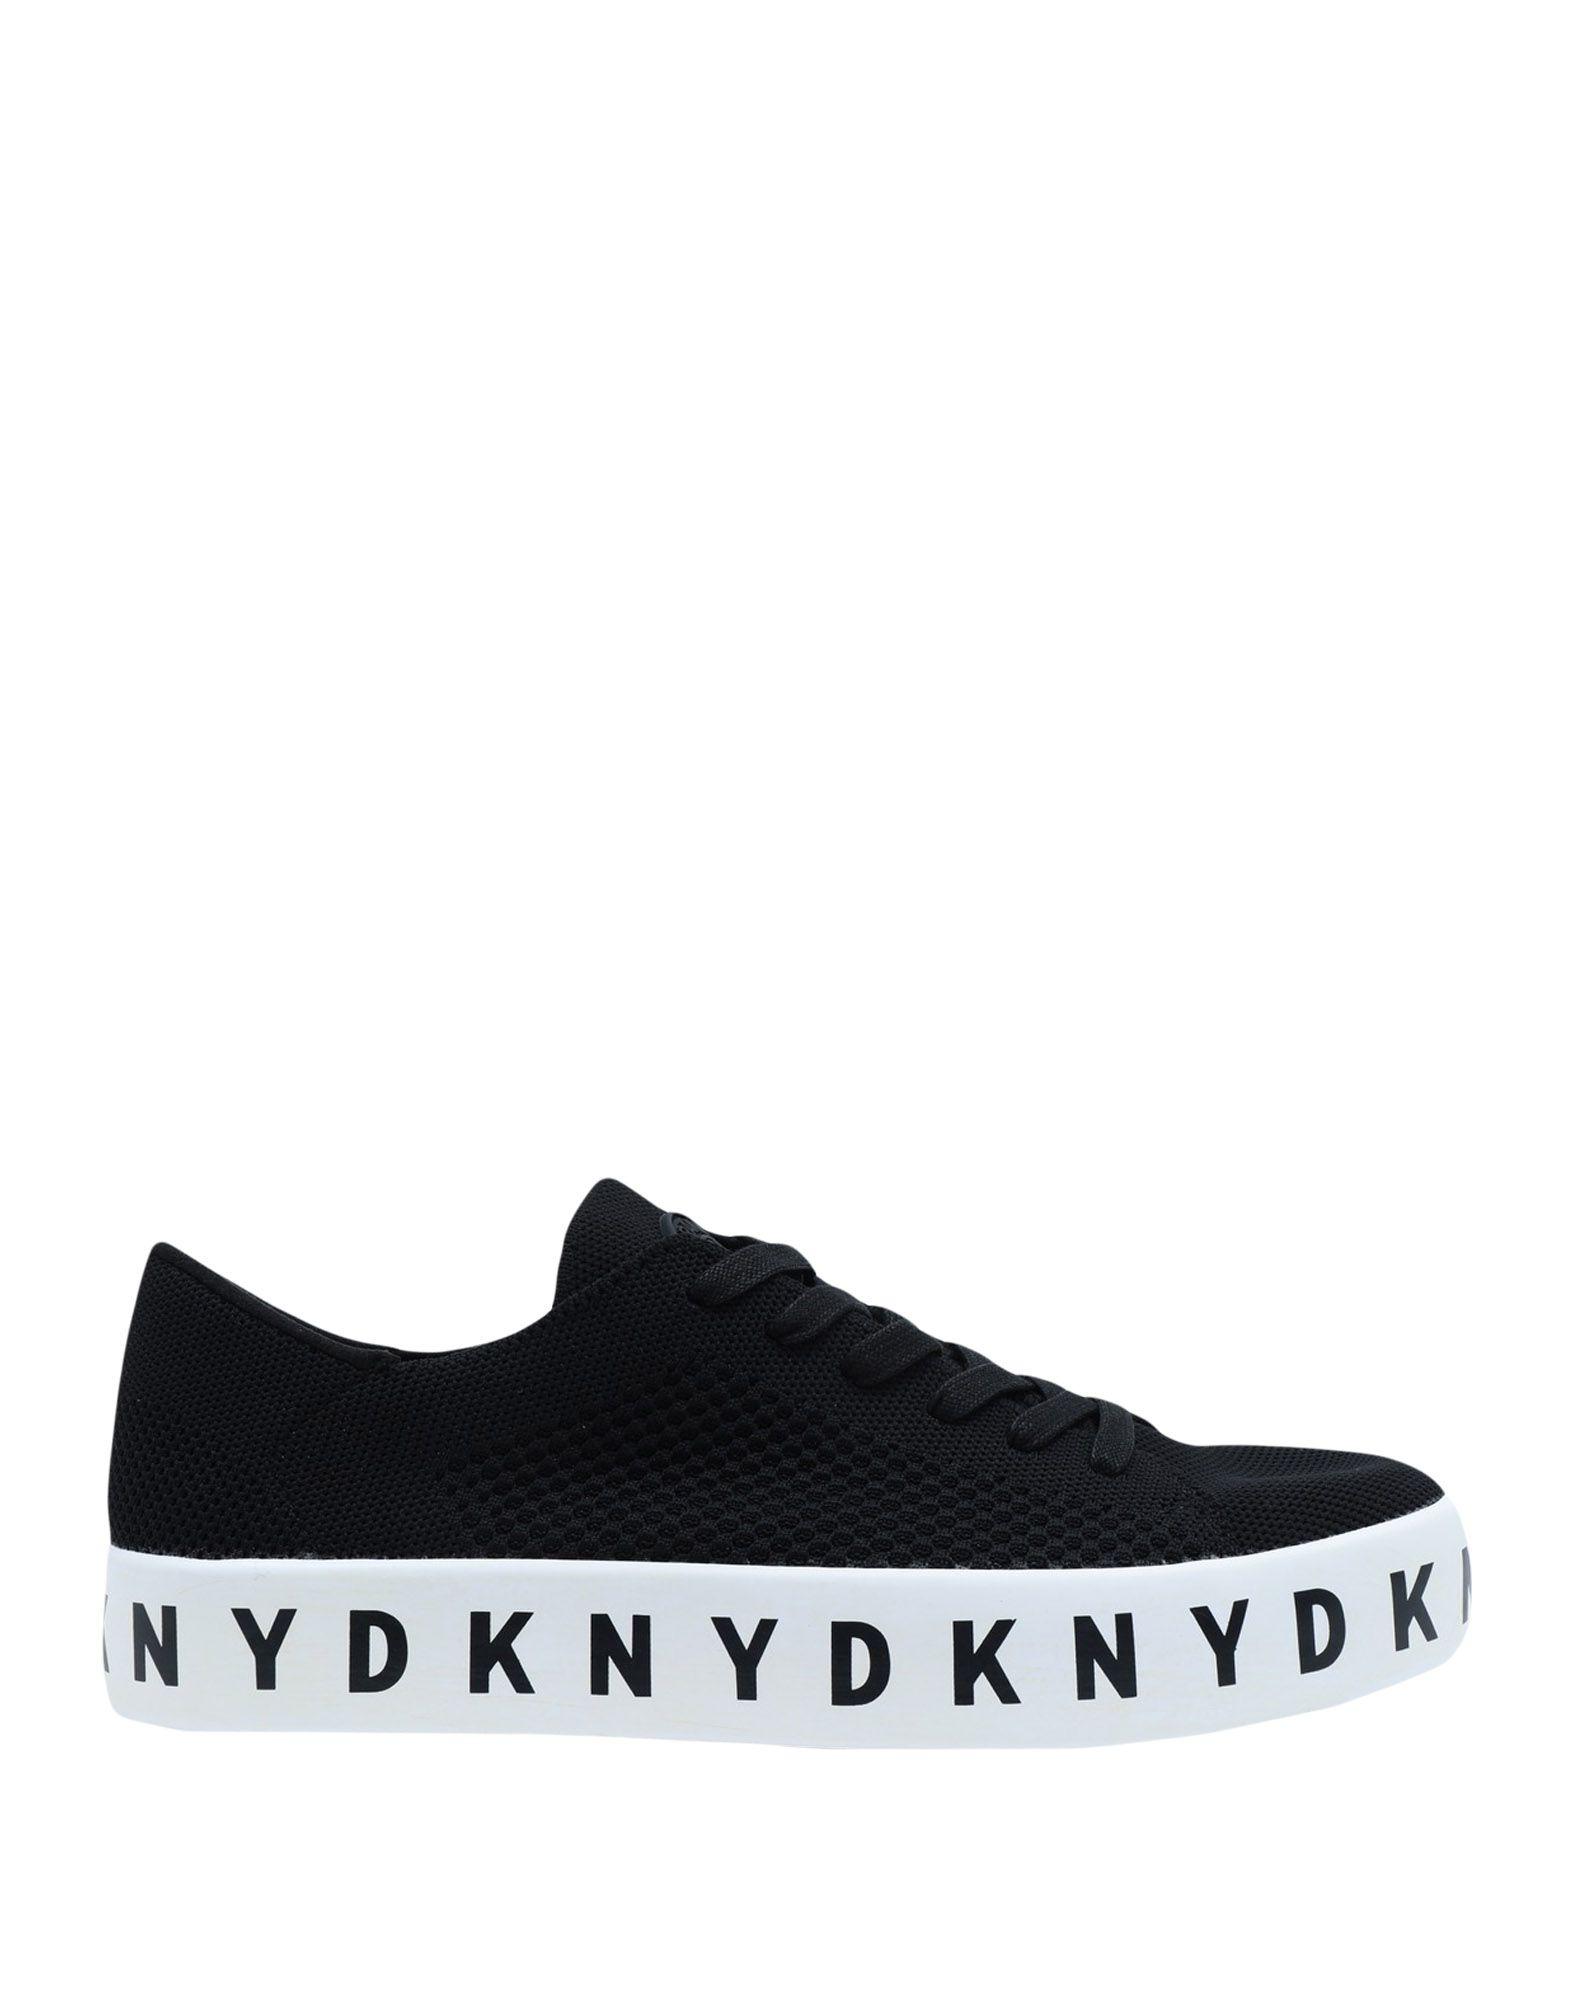 b88a3897a2bb96 Dkny Banson - Sneakers Damen - Sneakers Dkny auf YOOX - 11640715NC